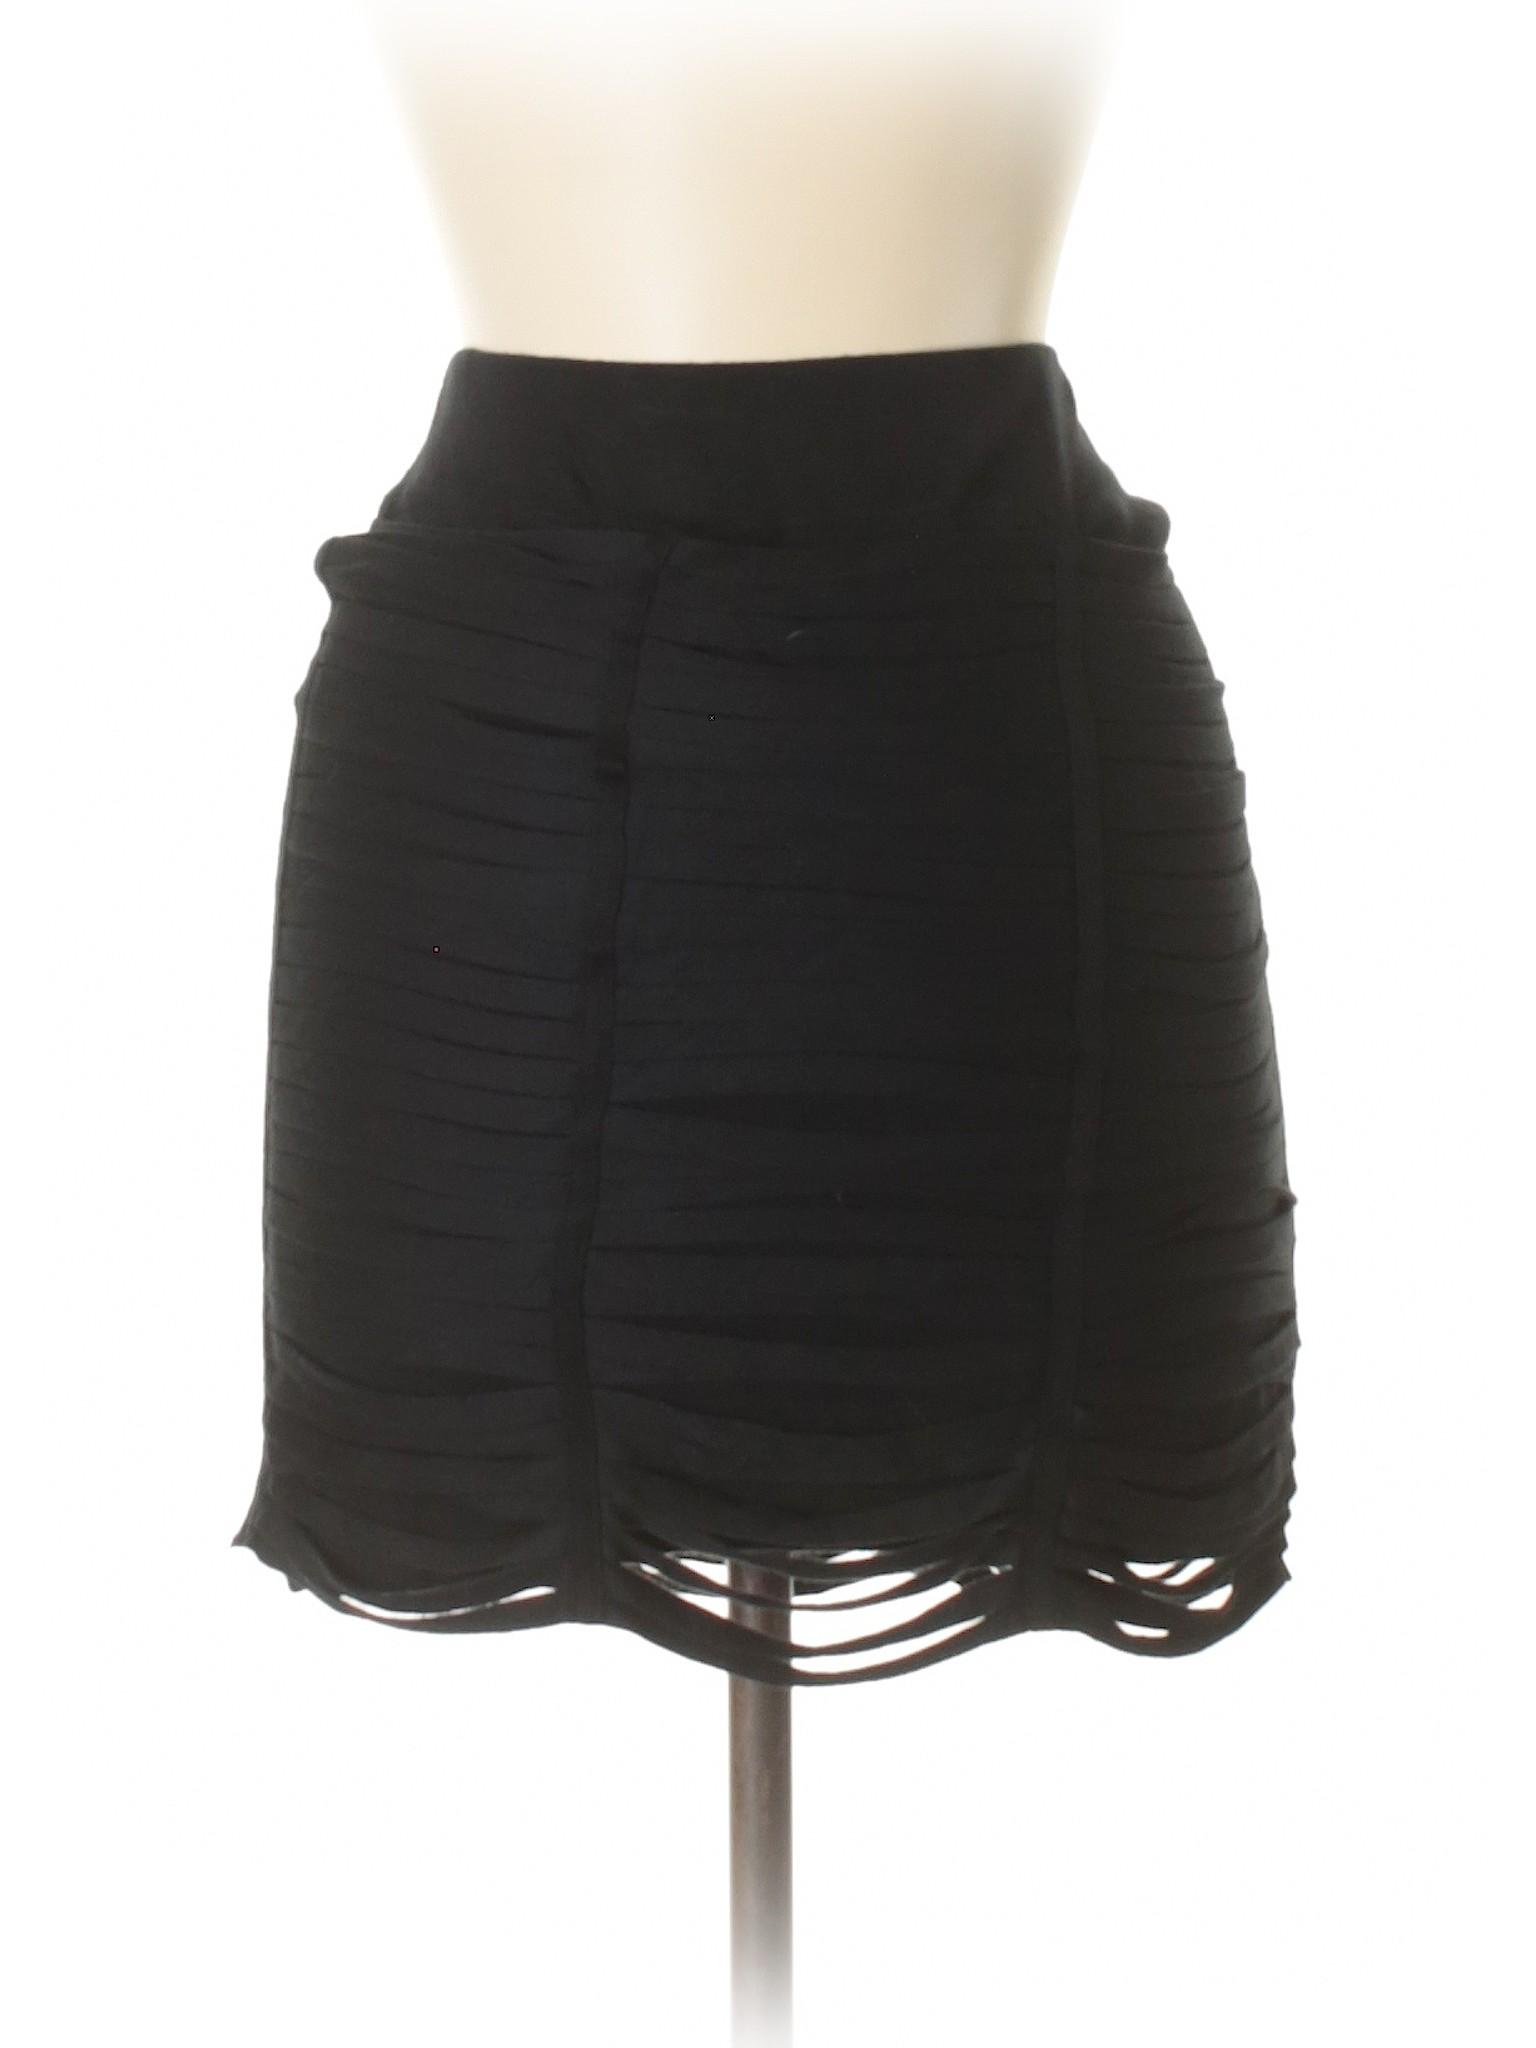 Skirt Denim Boutique Boutique Denim Skirt Tqxn1HI